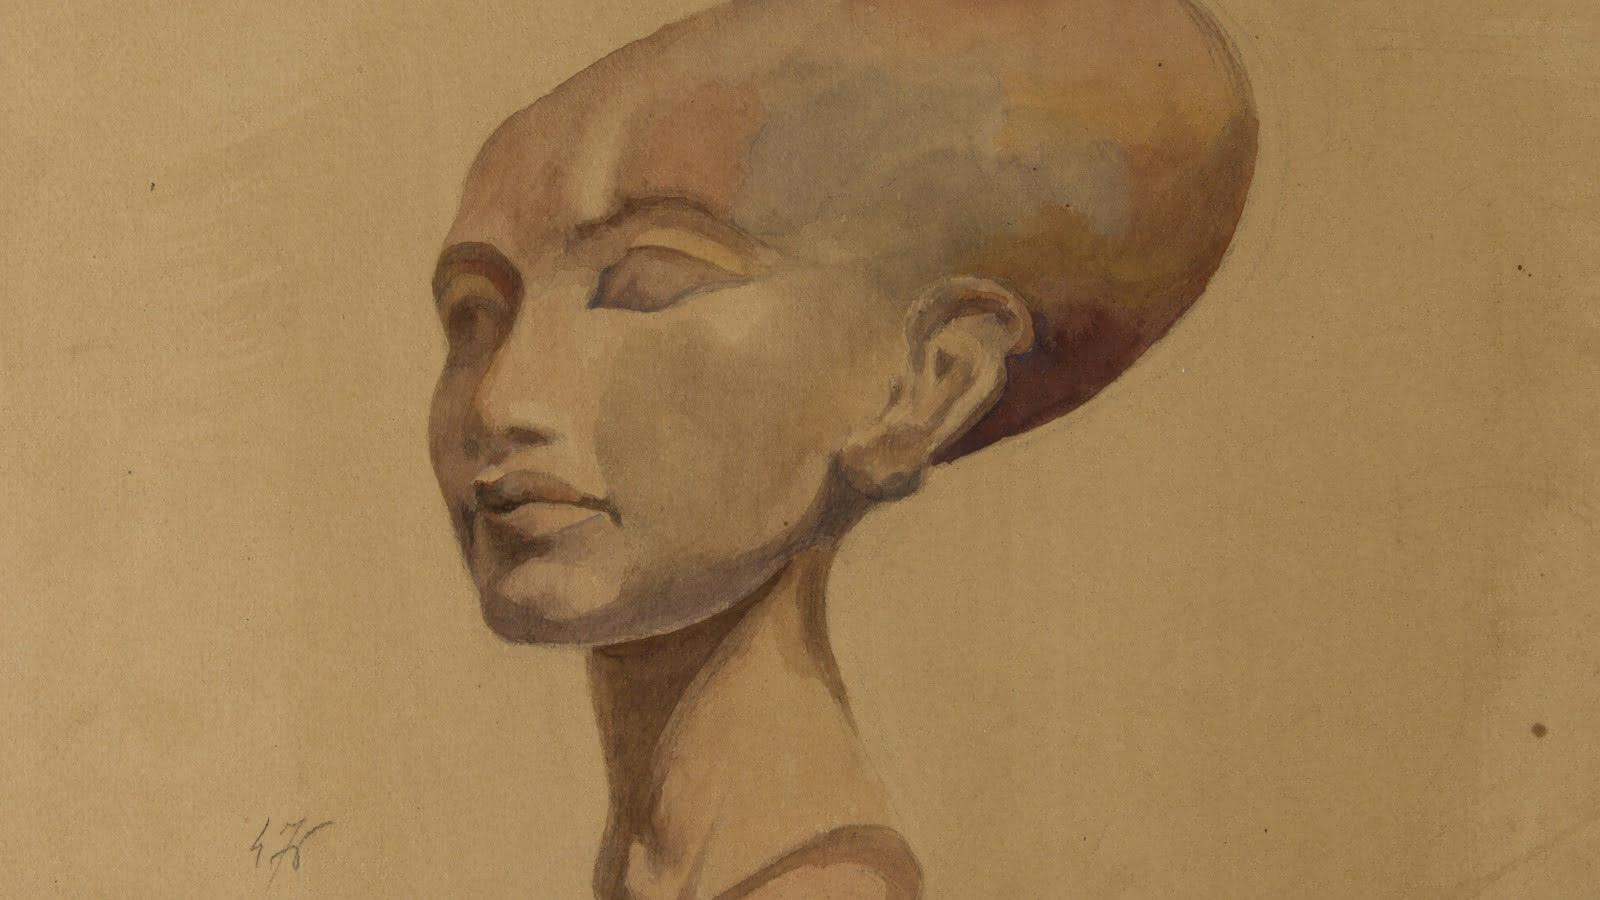 © Princesse amarnienne, fille du pharaon Akhenaton